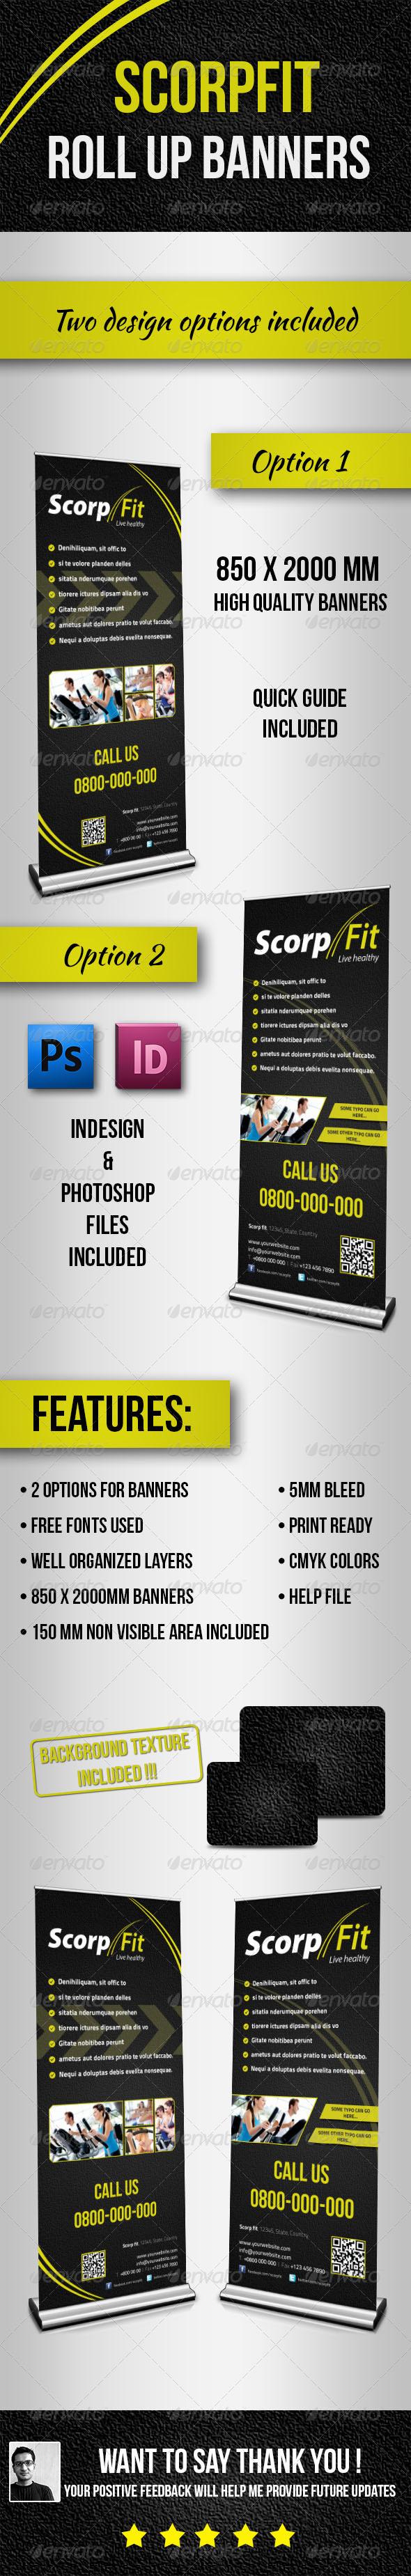 GraphicRiver Scorpfit Rollup Banners 4520142